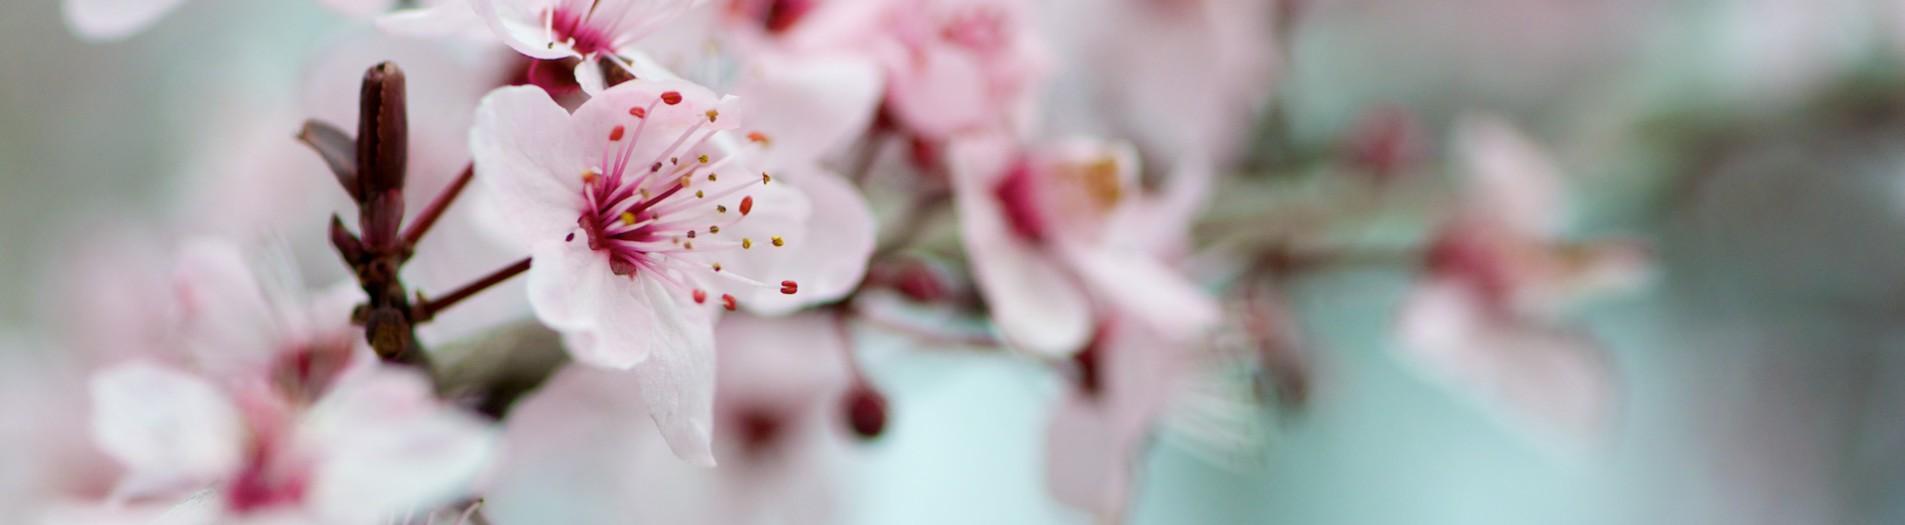 Ambiance printanière - Prunus Pissardii -